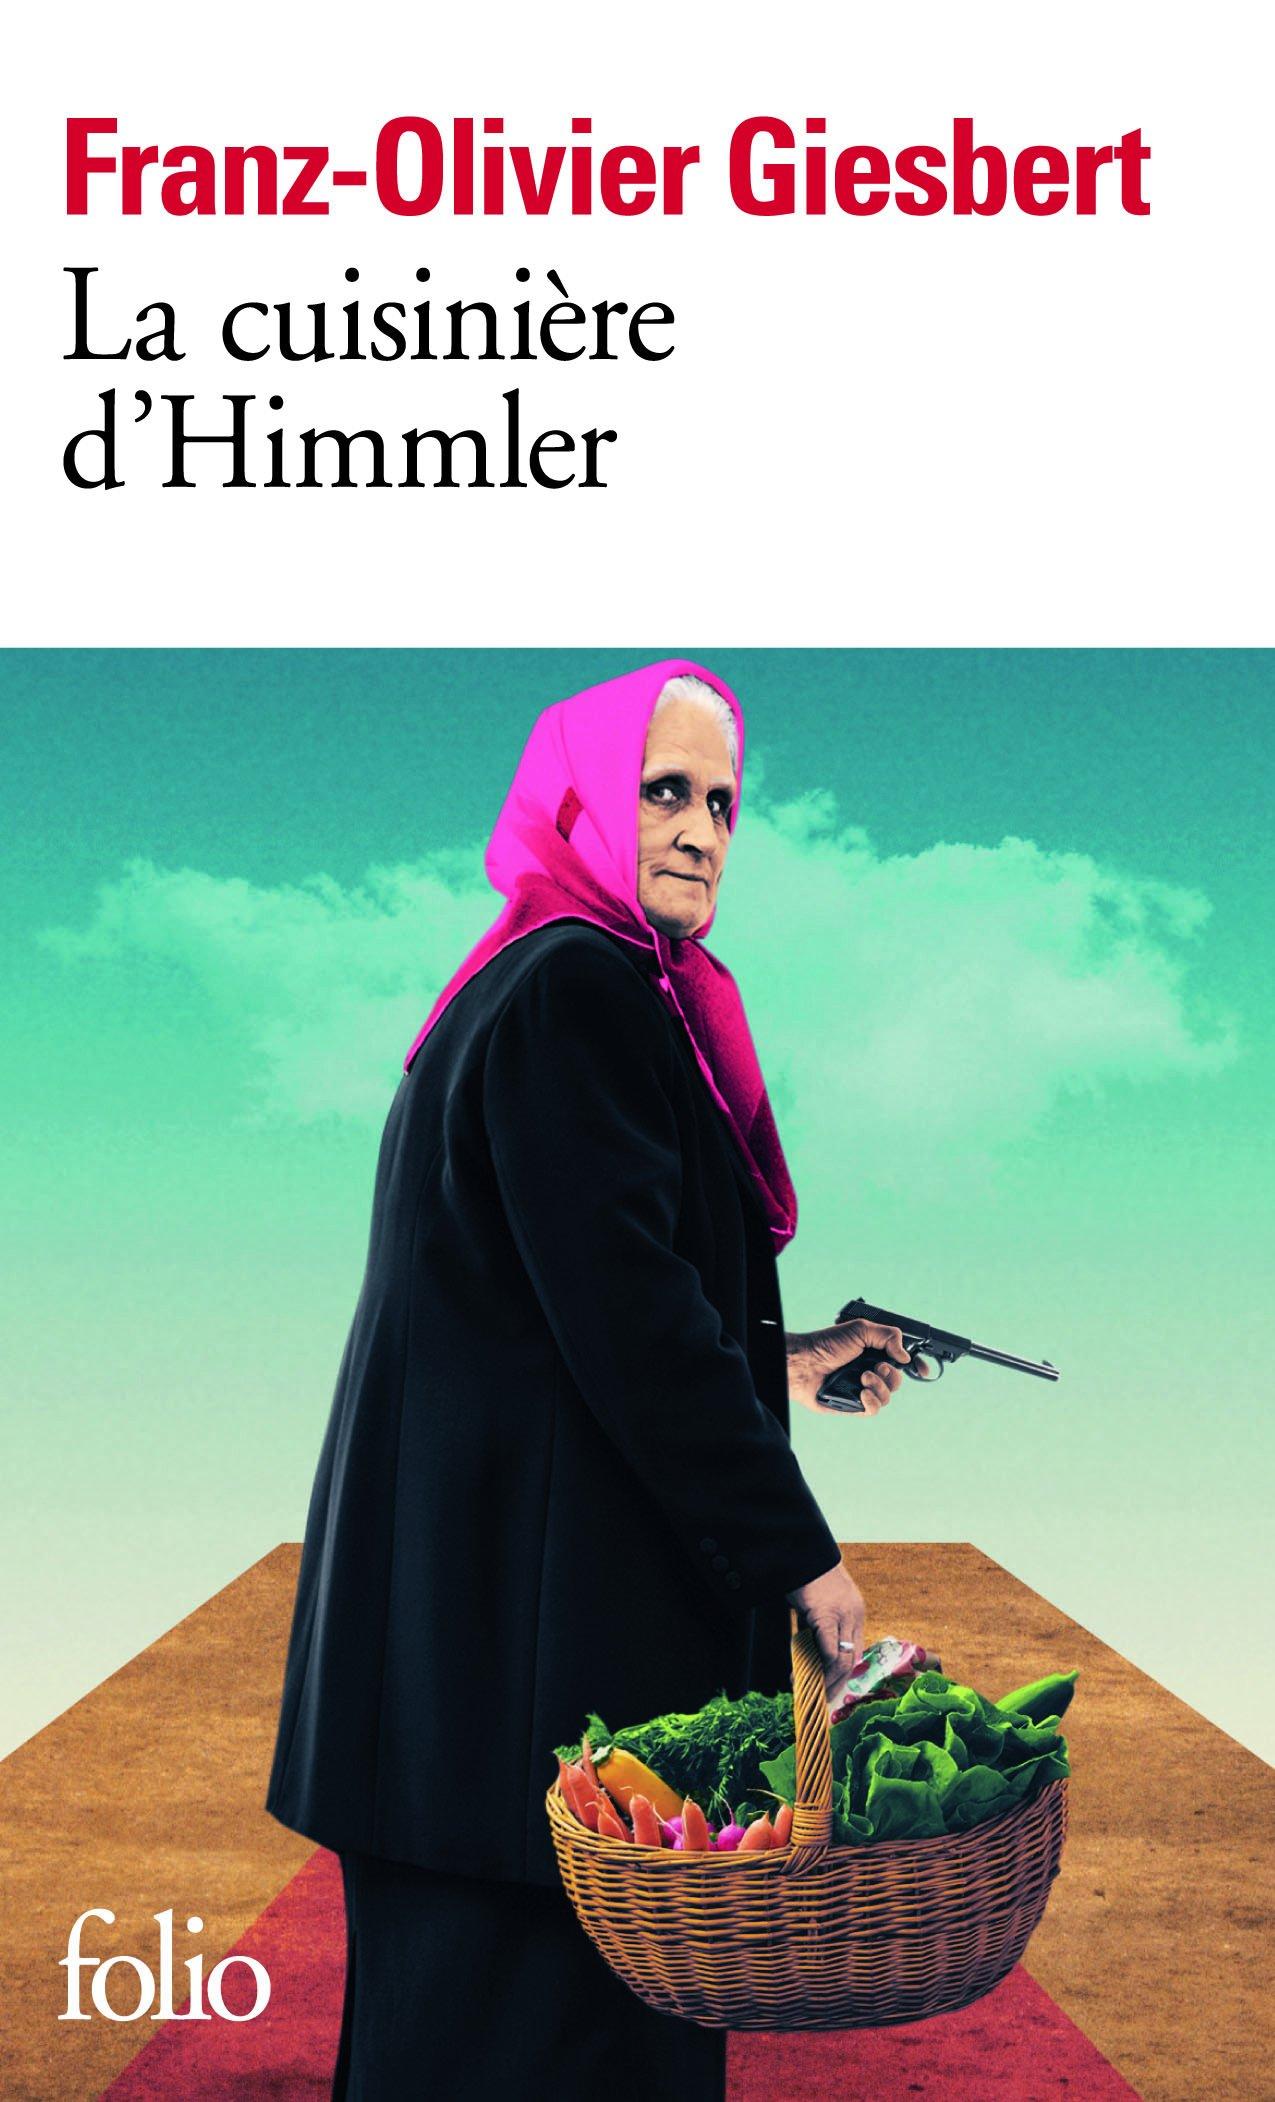 Franz-Olivier Giesbert, La cuisinière d'Himmler